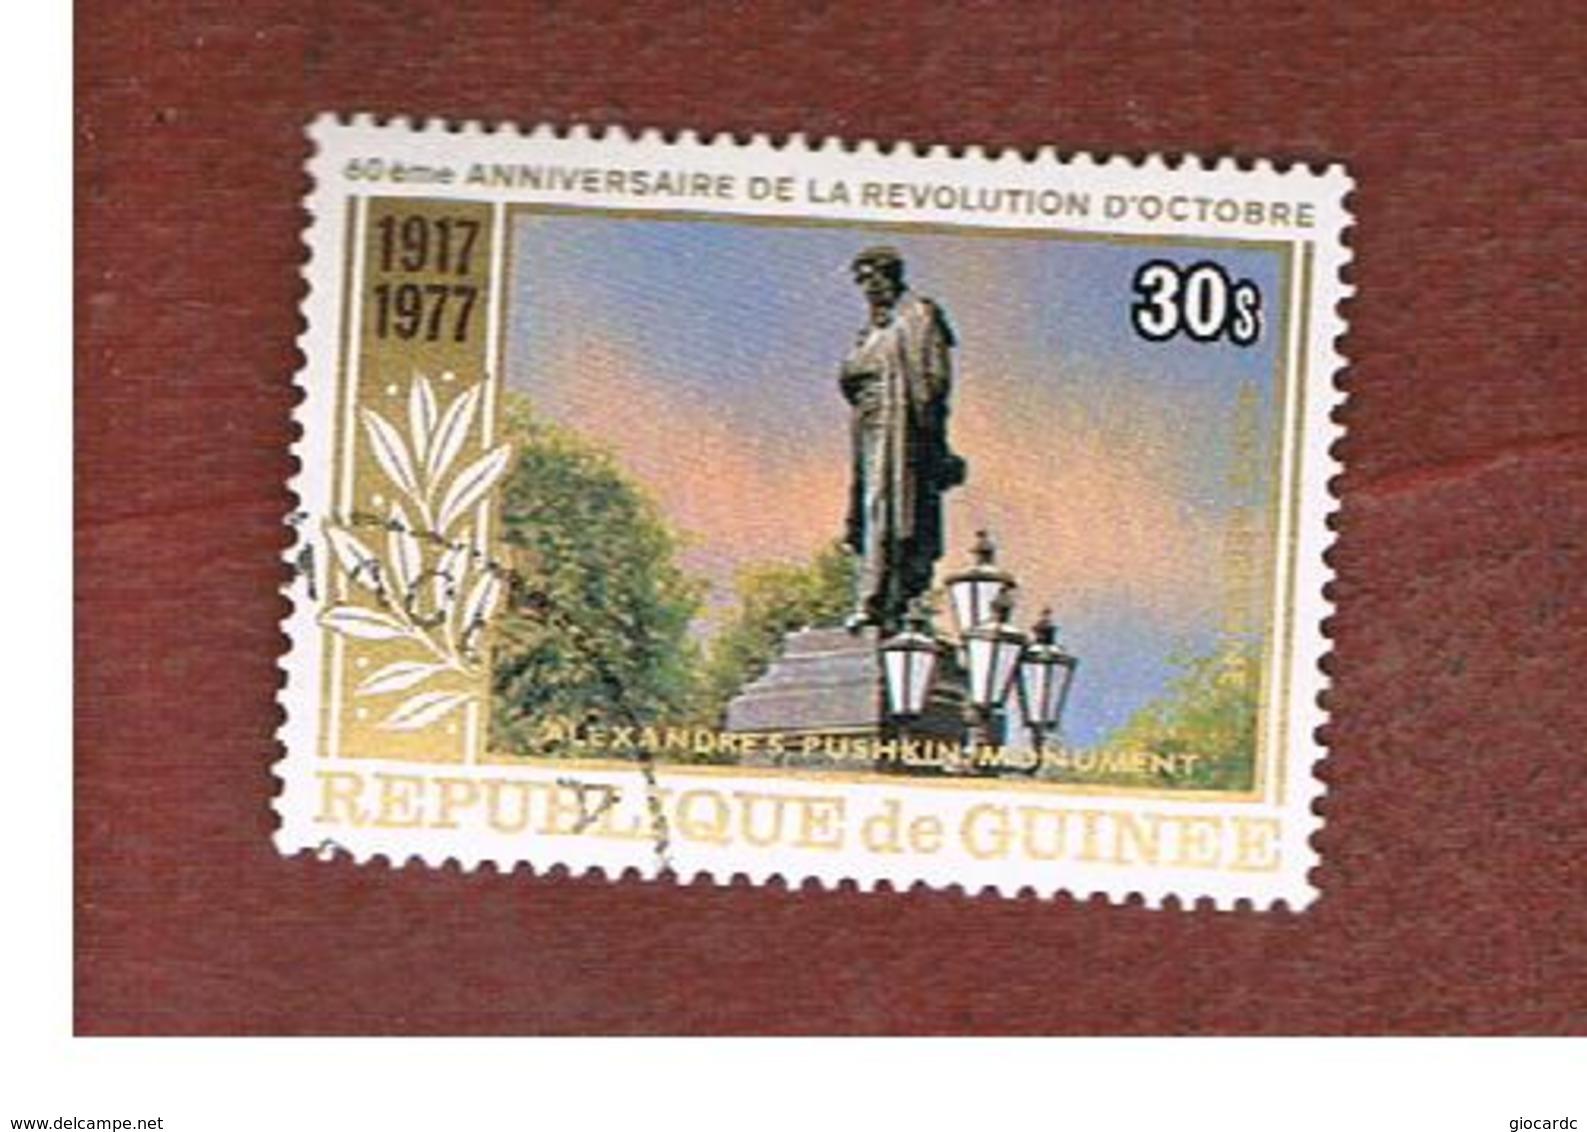 GUINEA -  SG 989   -  1978  RUSSIAN REVOLUTION ANNIVERSARY: PUSKIN MONUMENT  - USED ° - Guinea (1958-...)